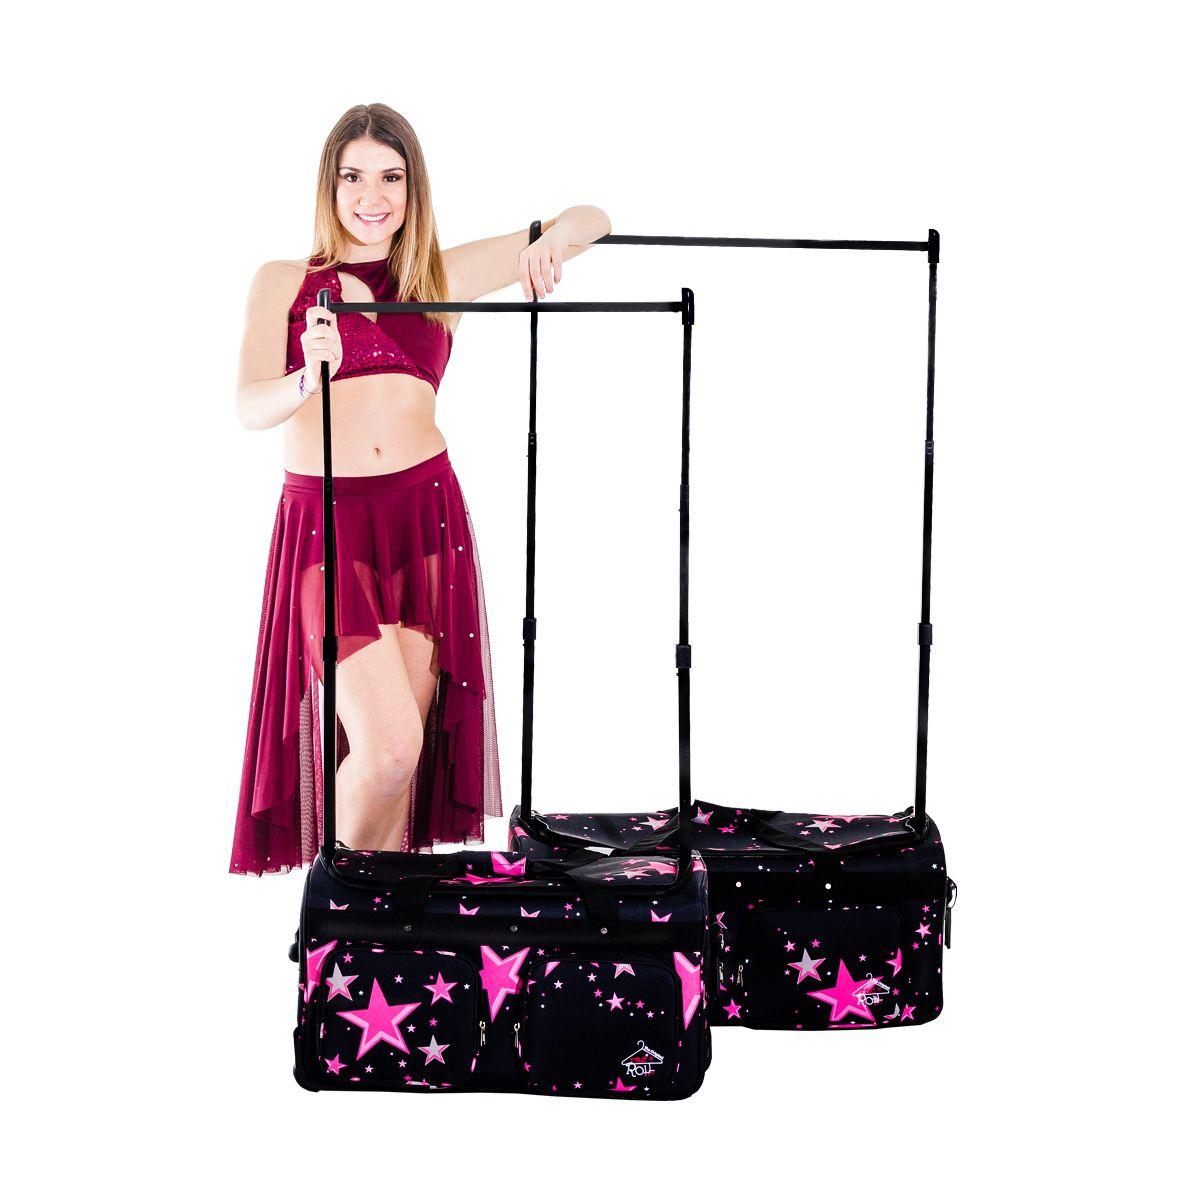 Medium Pink Stars dance competition garment bag by RacNRoll